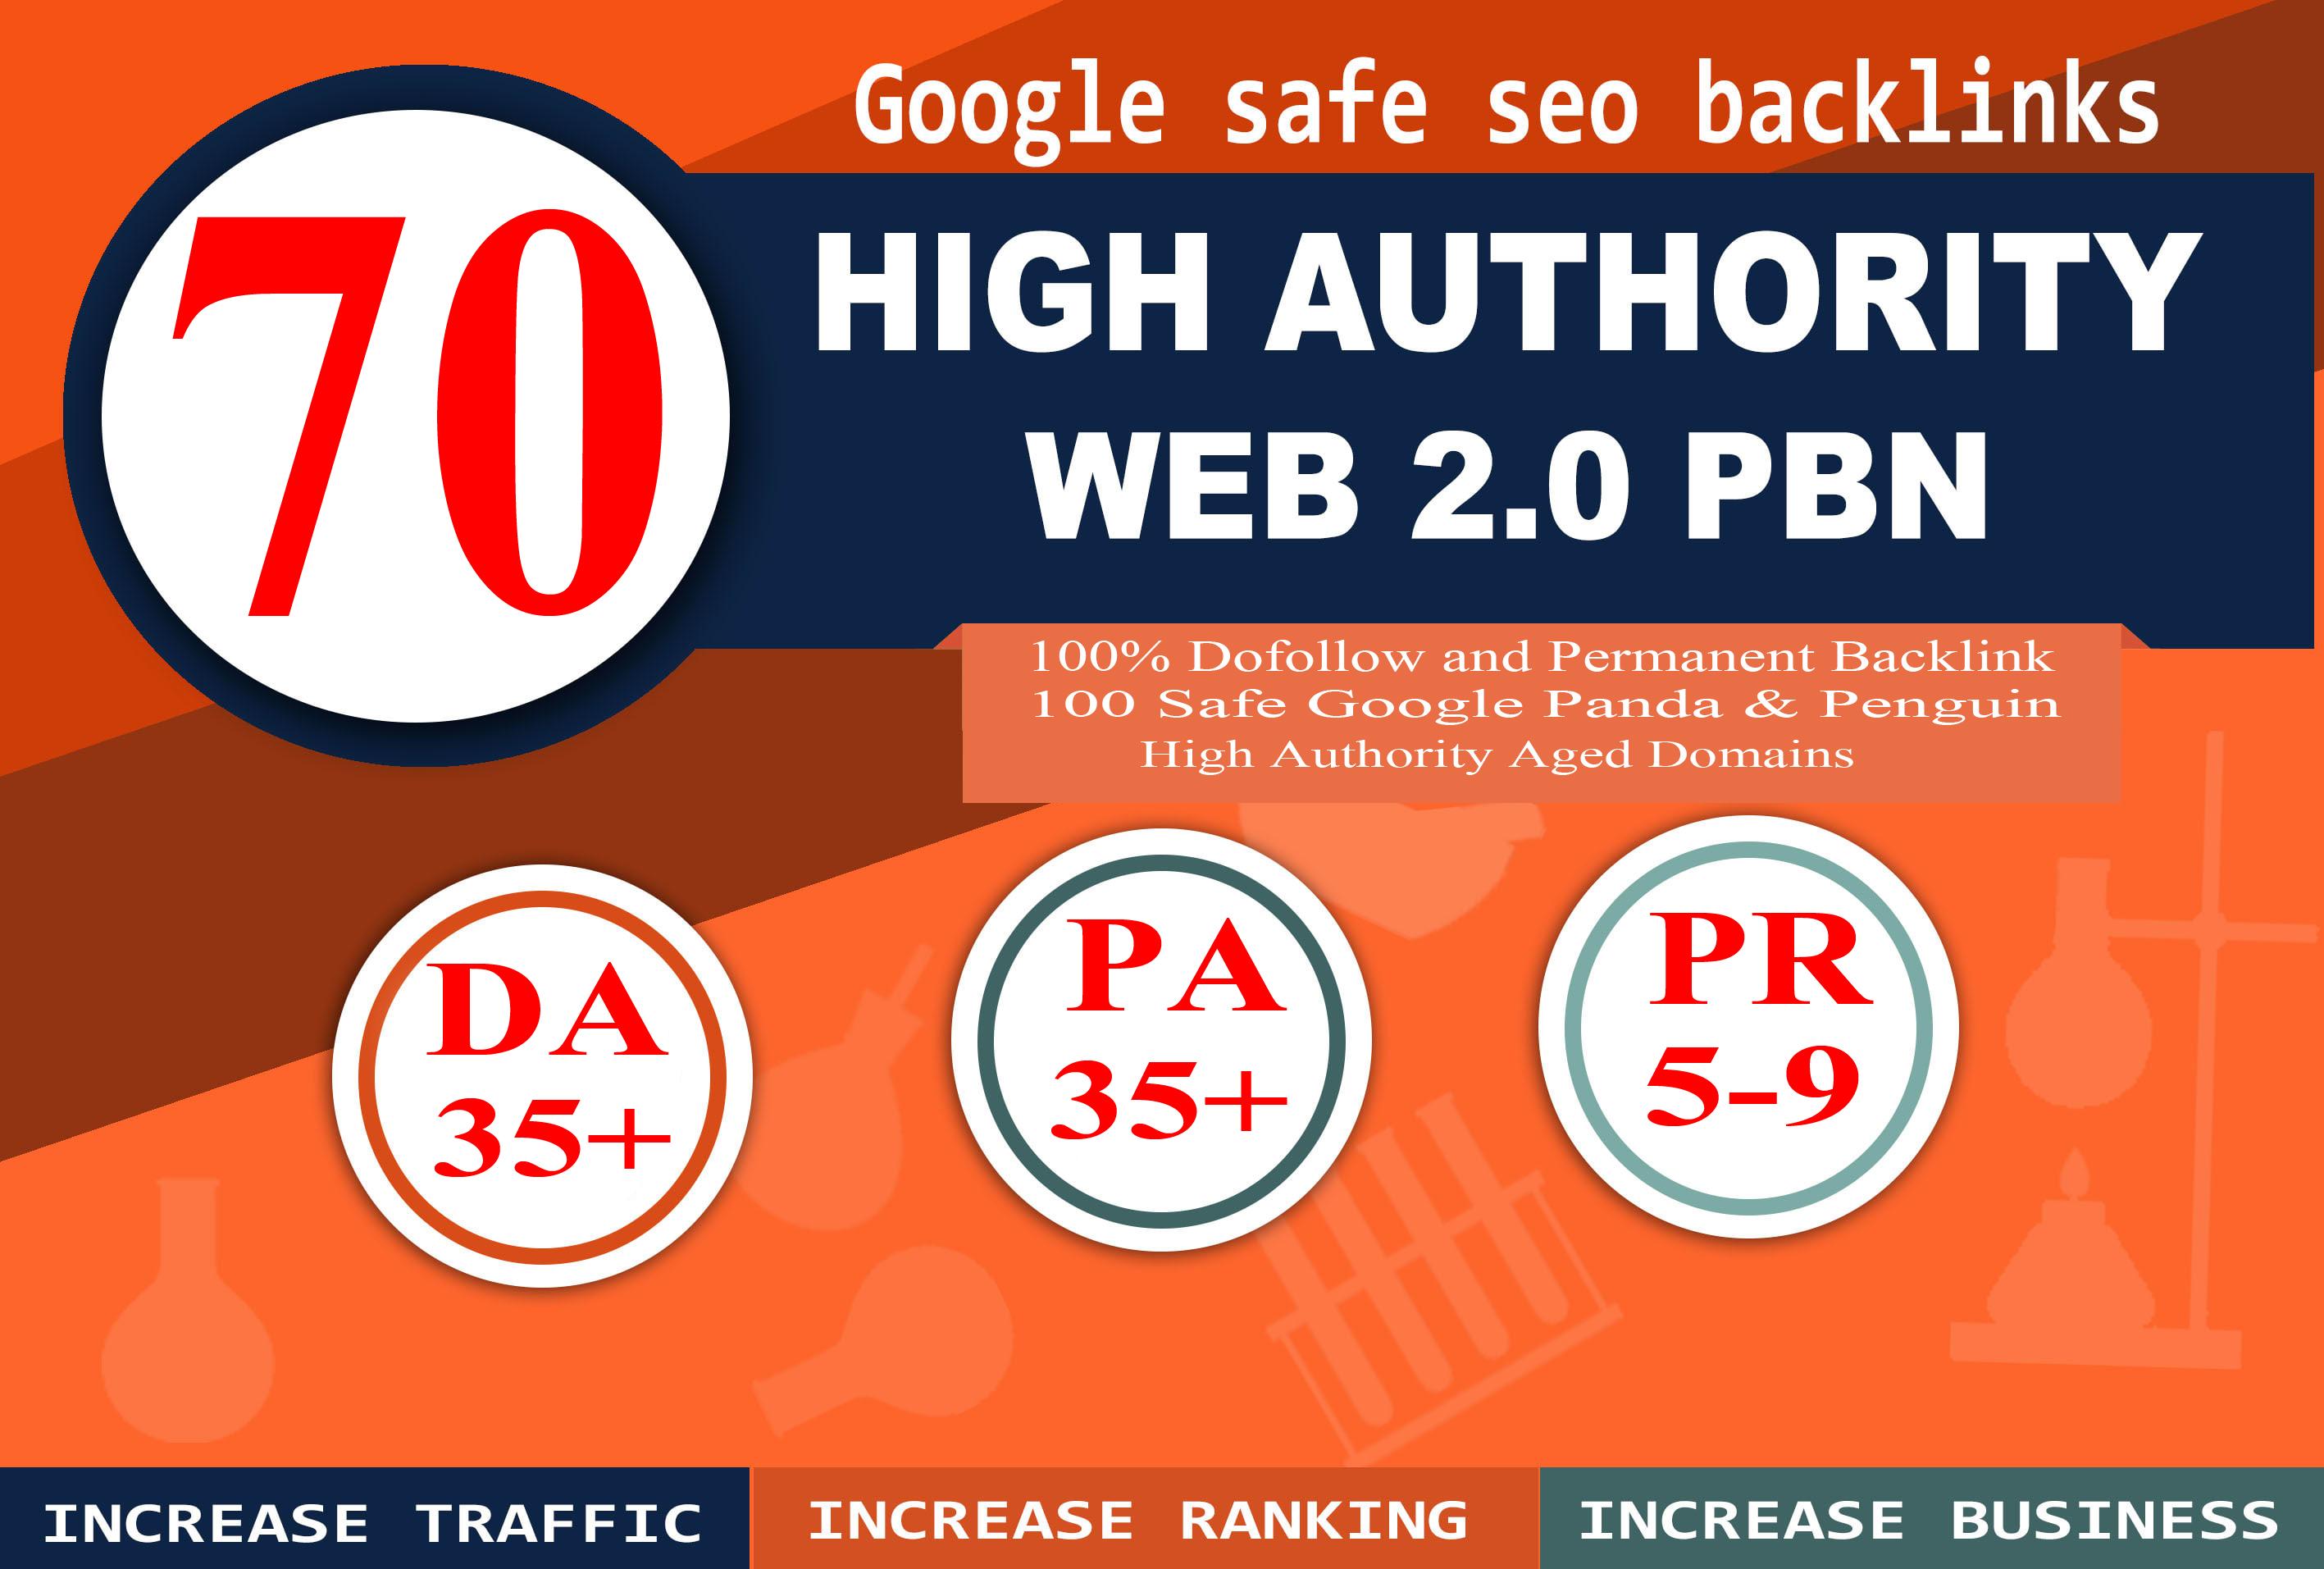 70+ Permanent PBN Backlinks Web2.0 With High TF CF DA PA Do-follow Links Homepage Unique website